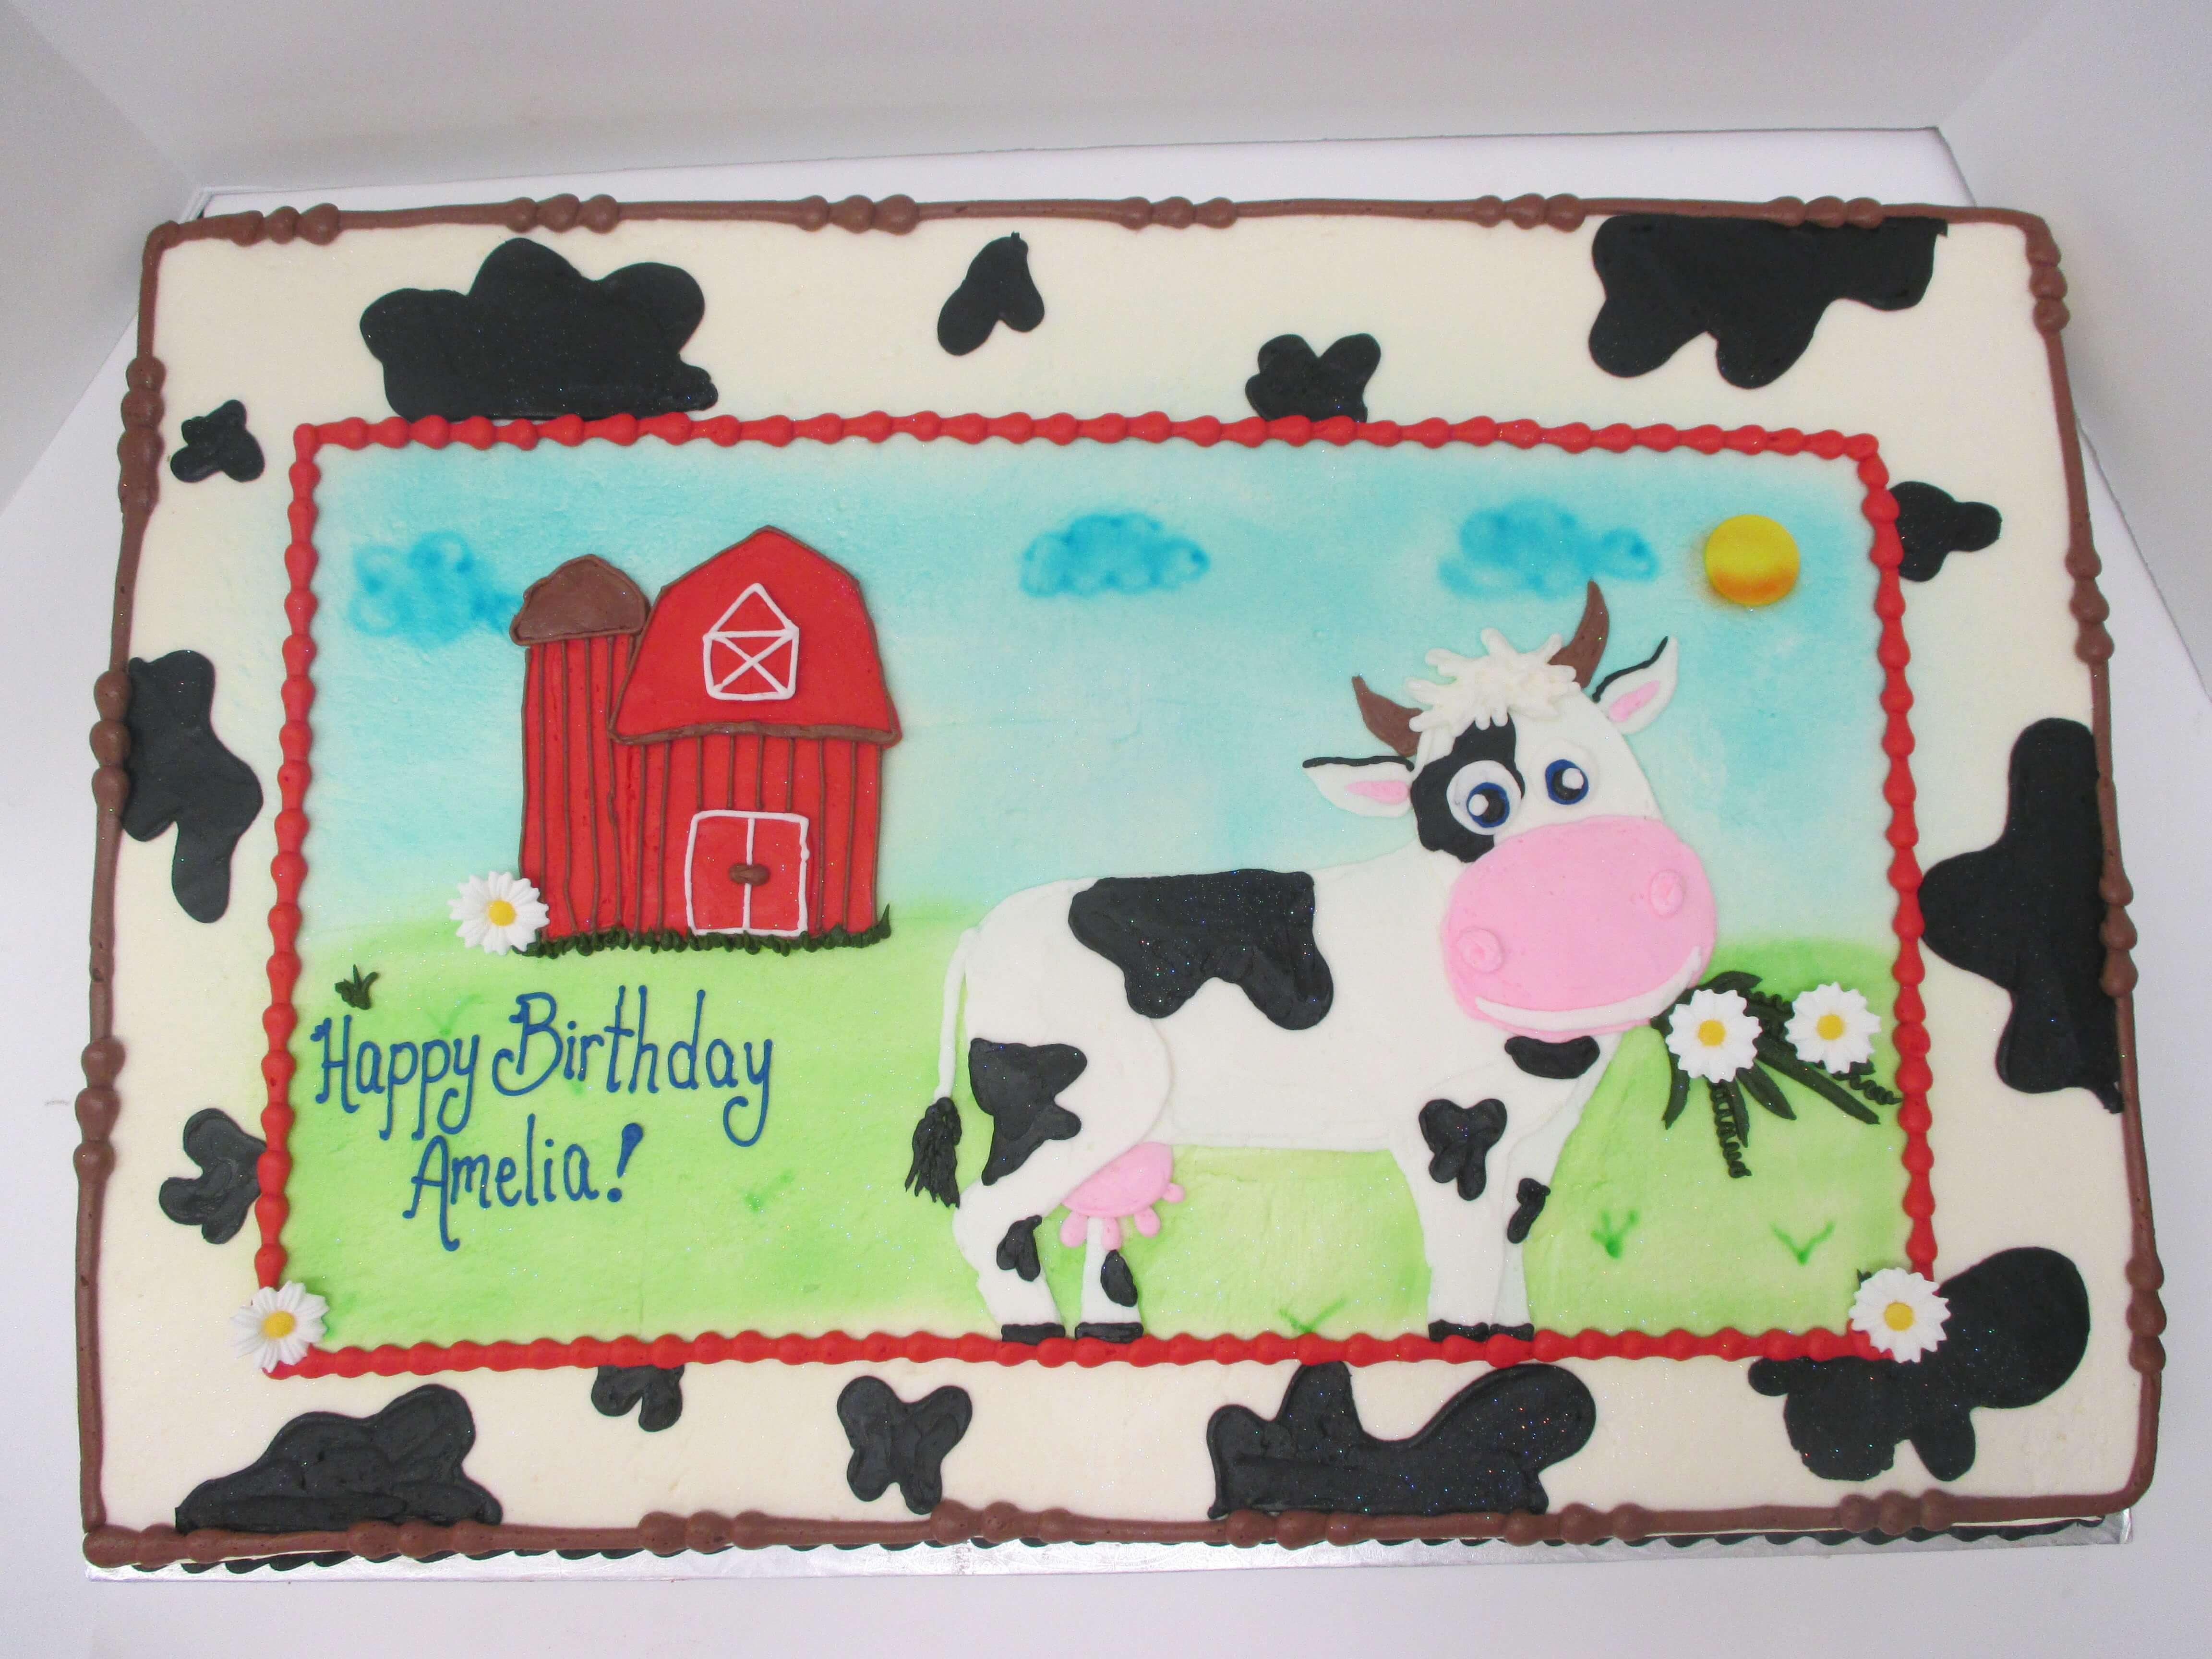 Kids Birthday Cakes The Bake Shoppe Oregon Dairy